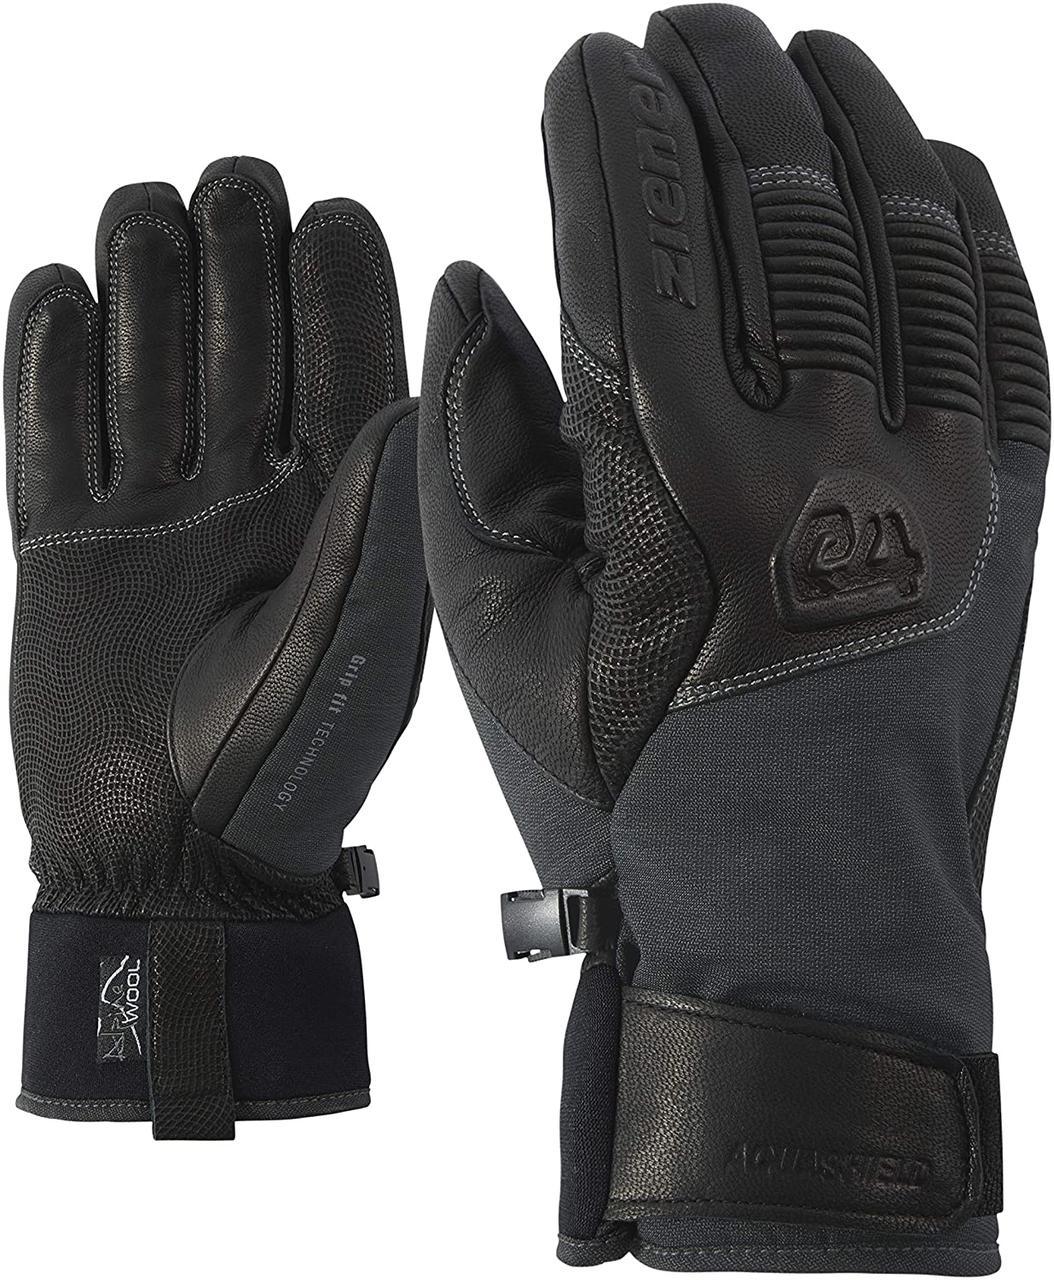 Гірськолижні рукавиці Ziener Herren Ganzenberg As(r) Aw | 11 (XXL)